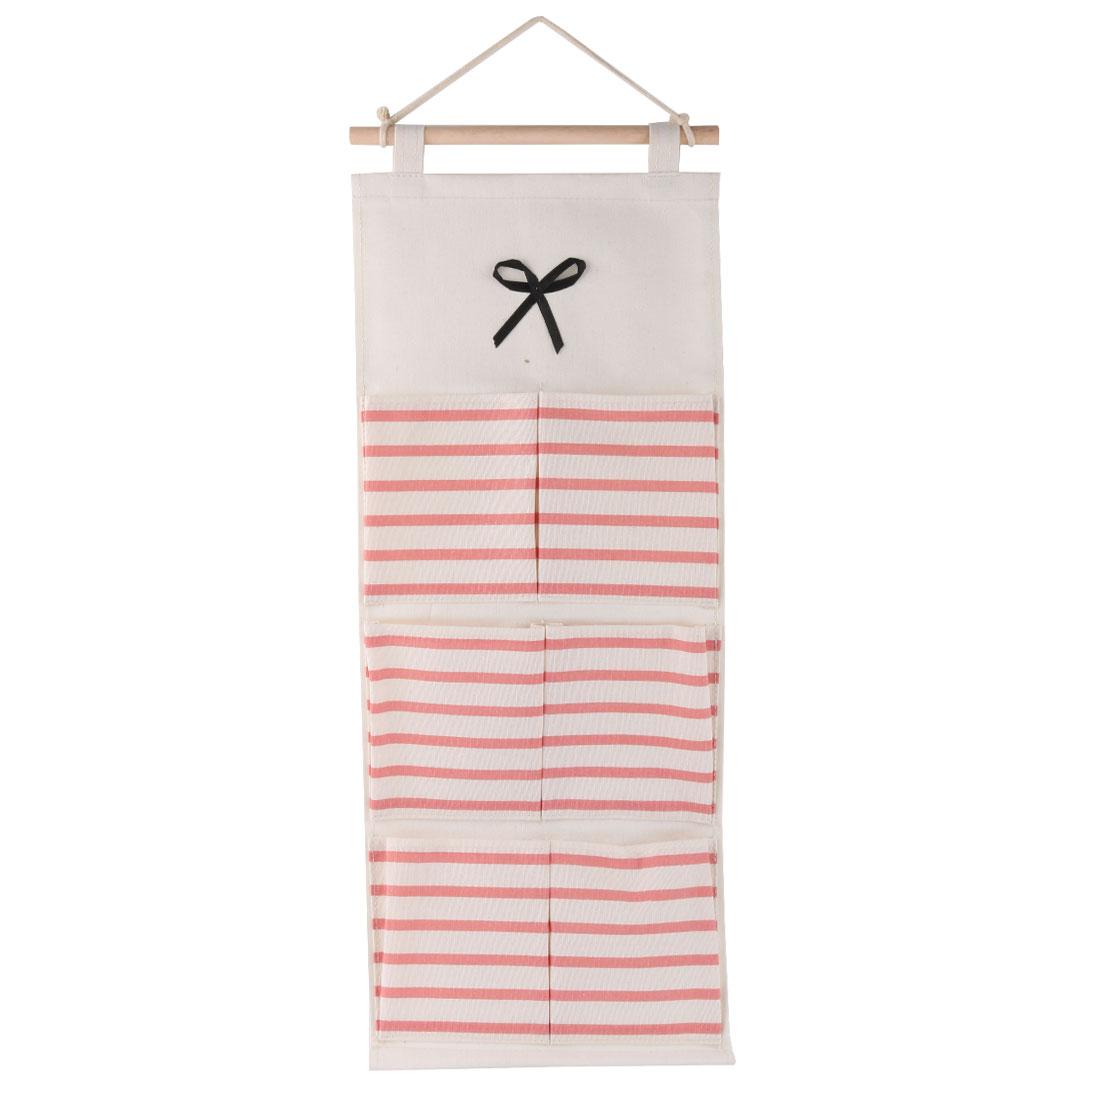 Dormitory Wall Stripe Print 6 Pockets Sundry Key Holder Hanging Bag Case Pink - image 4 of 4